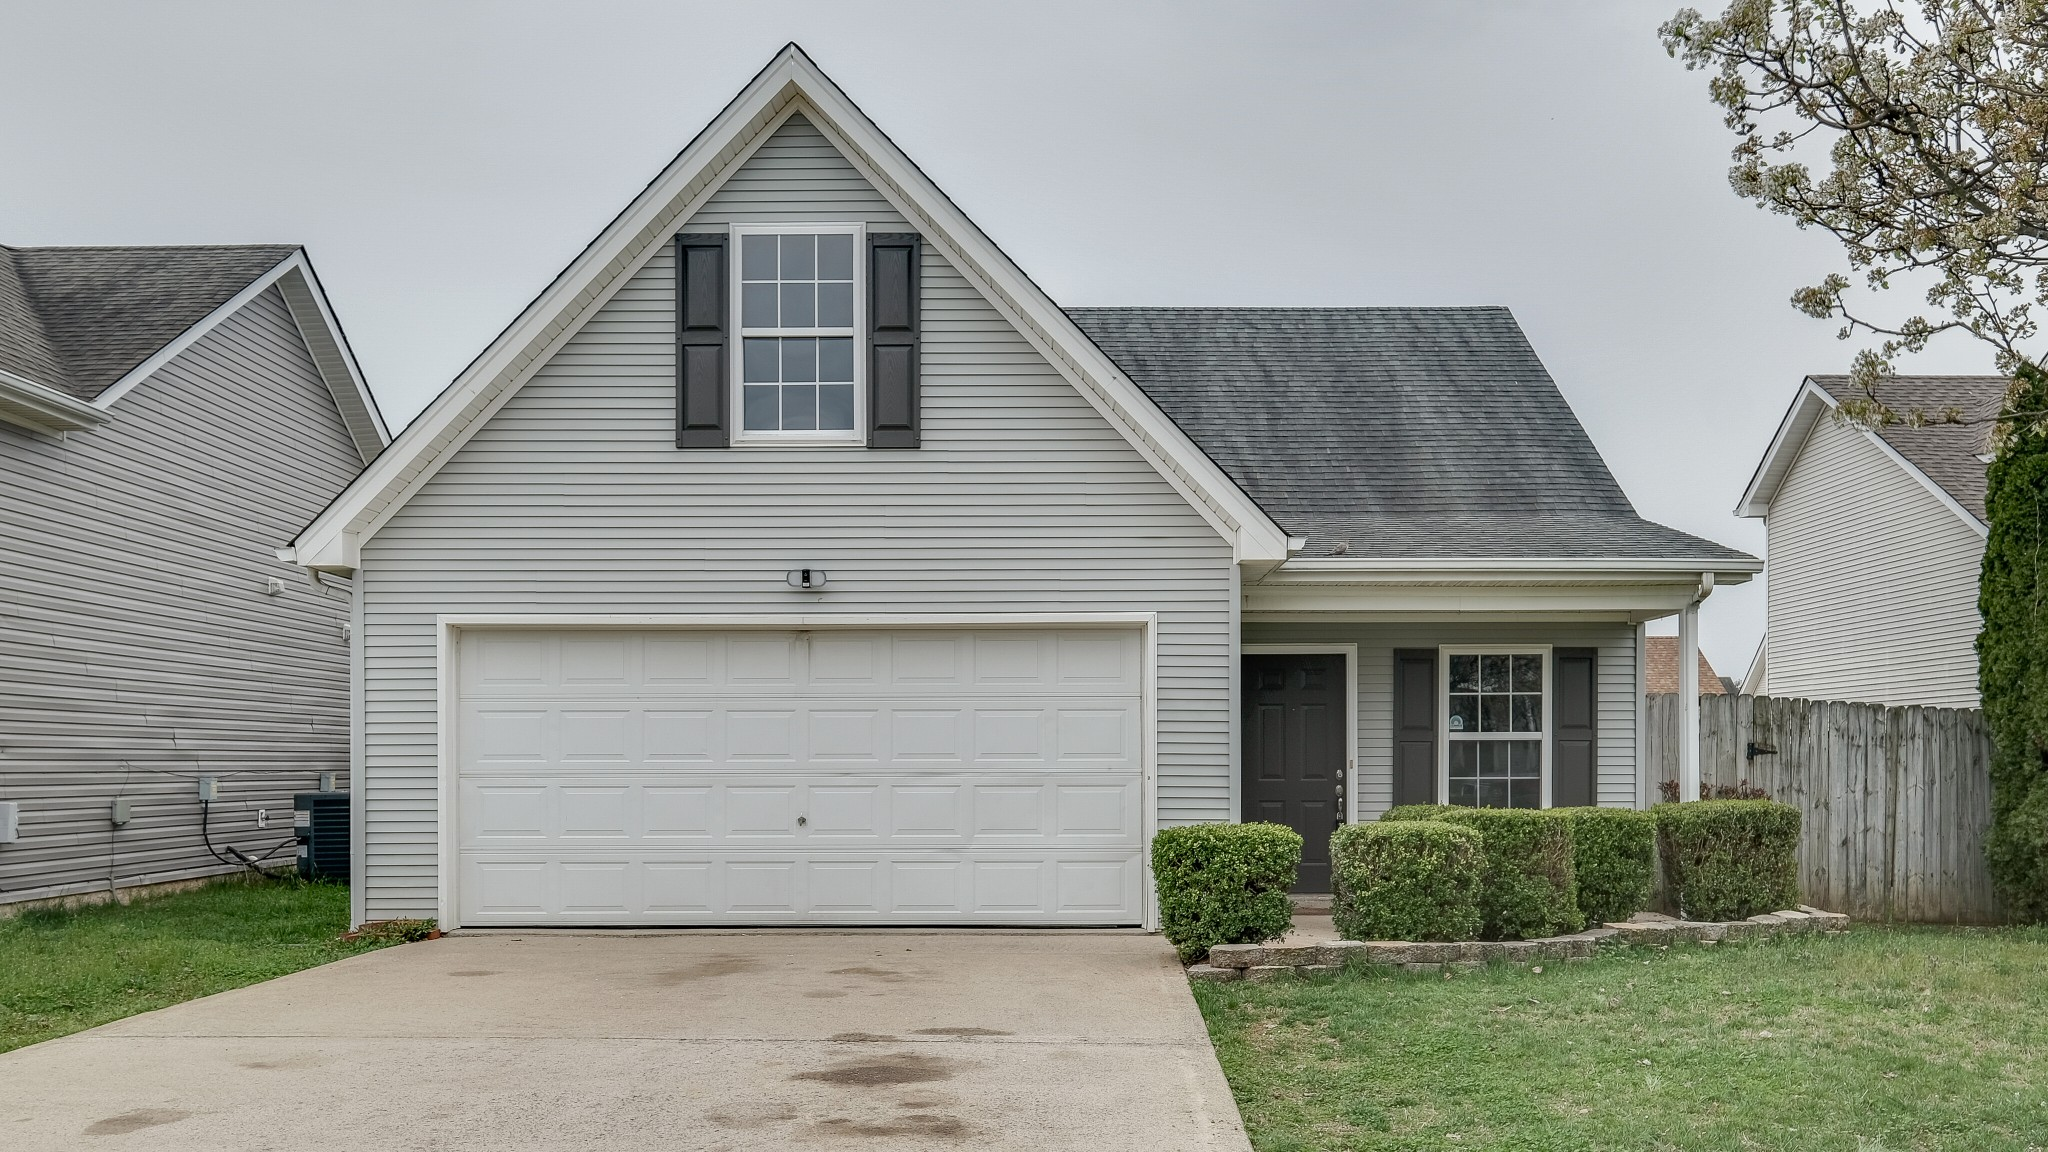 Adams Pointe Sec 3 Real Estate Listings Main Image